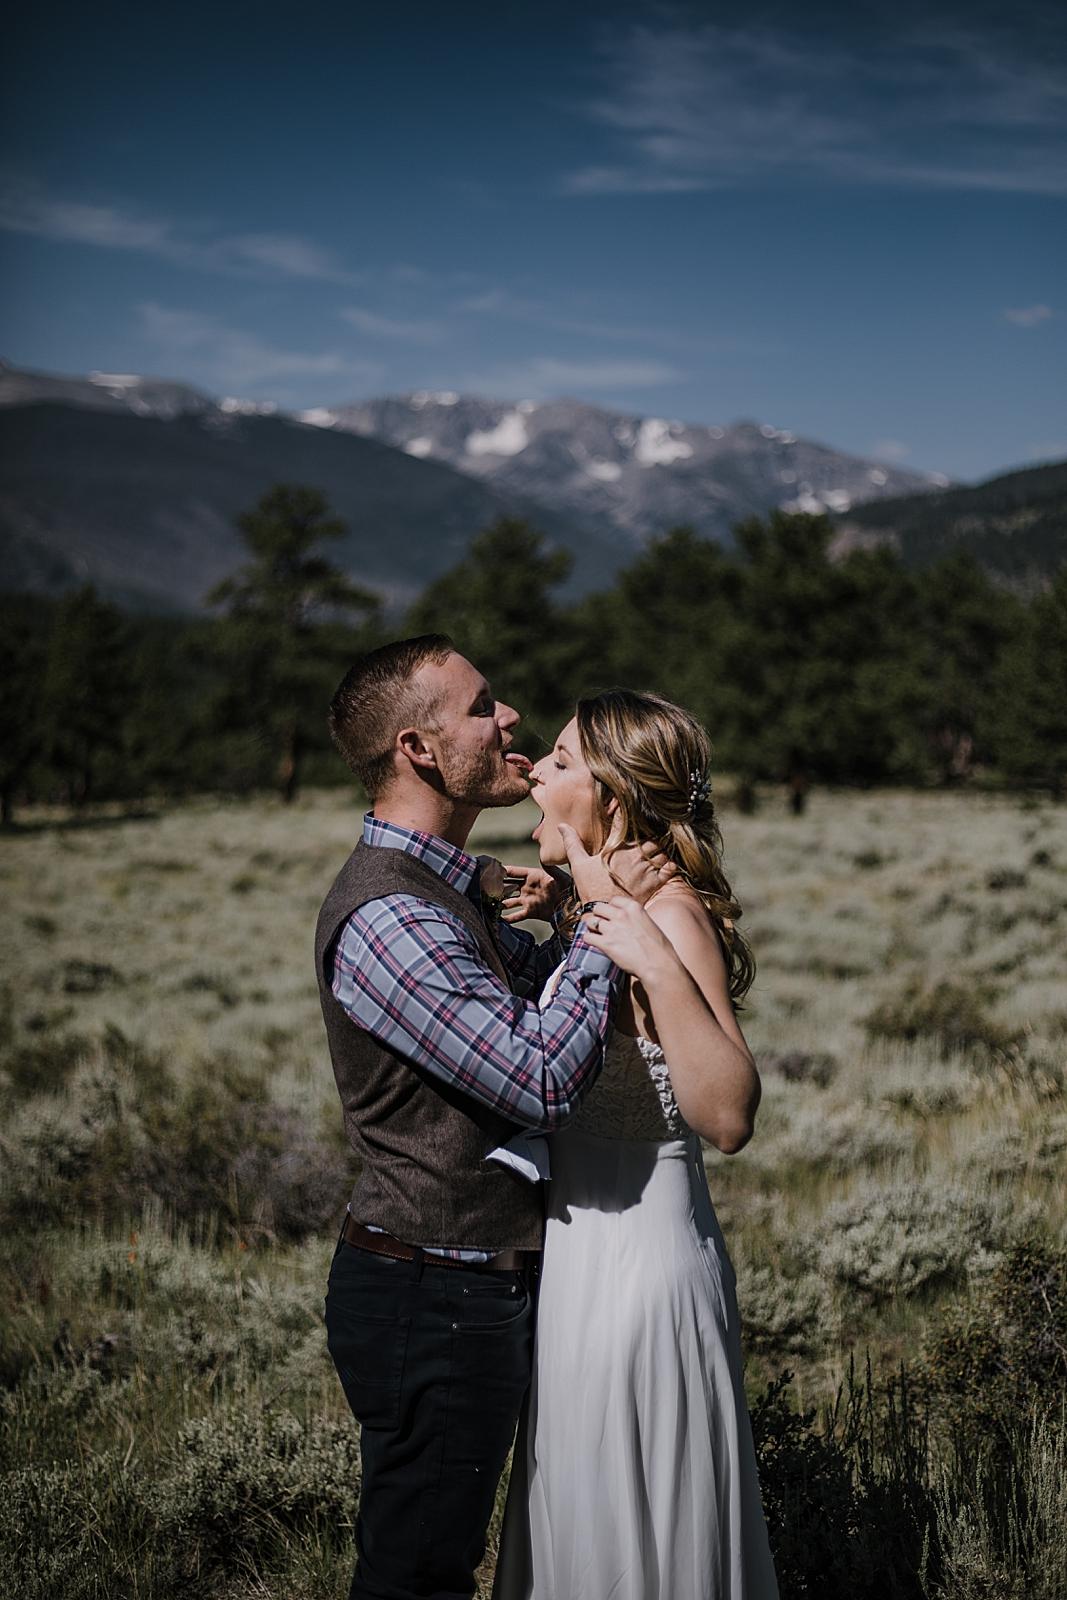 groom licks bride, RMNP elopement ceremony, rocky mountain national park elopement, 3M curves elopement, self solemnizing, self solemnization, long's peak, summer elopement, estes park elopement